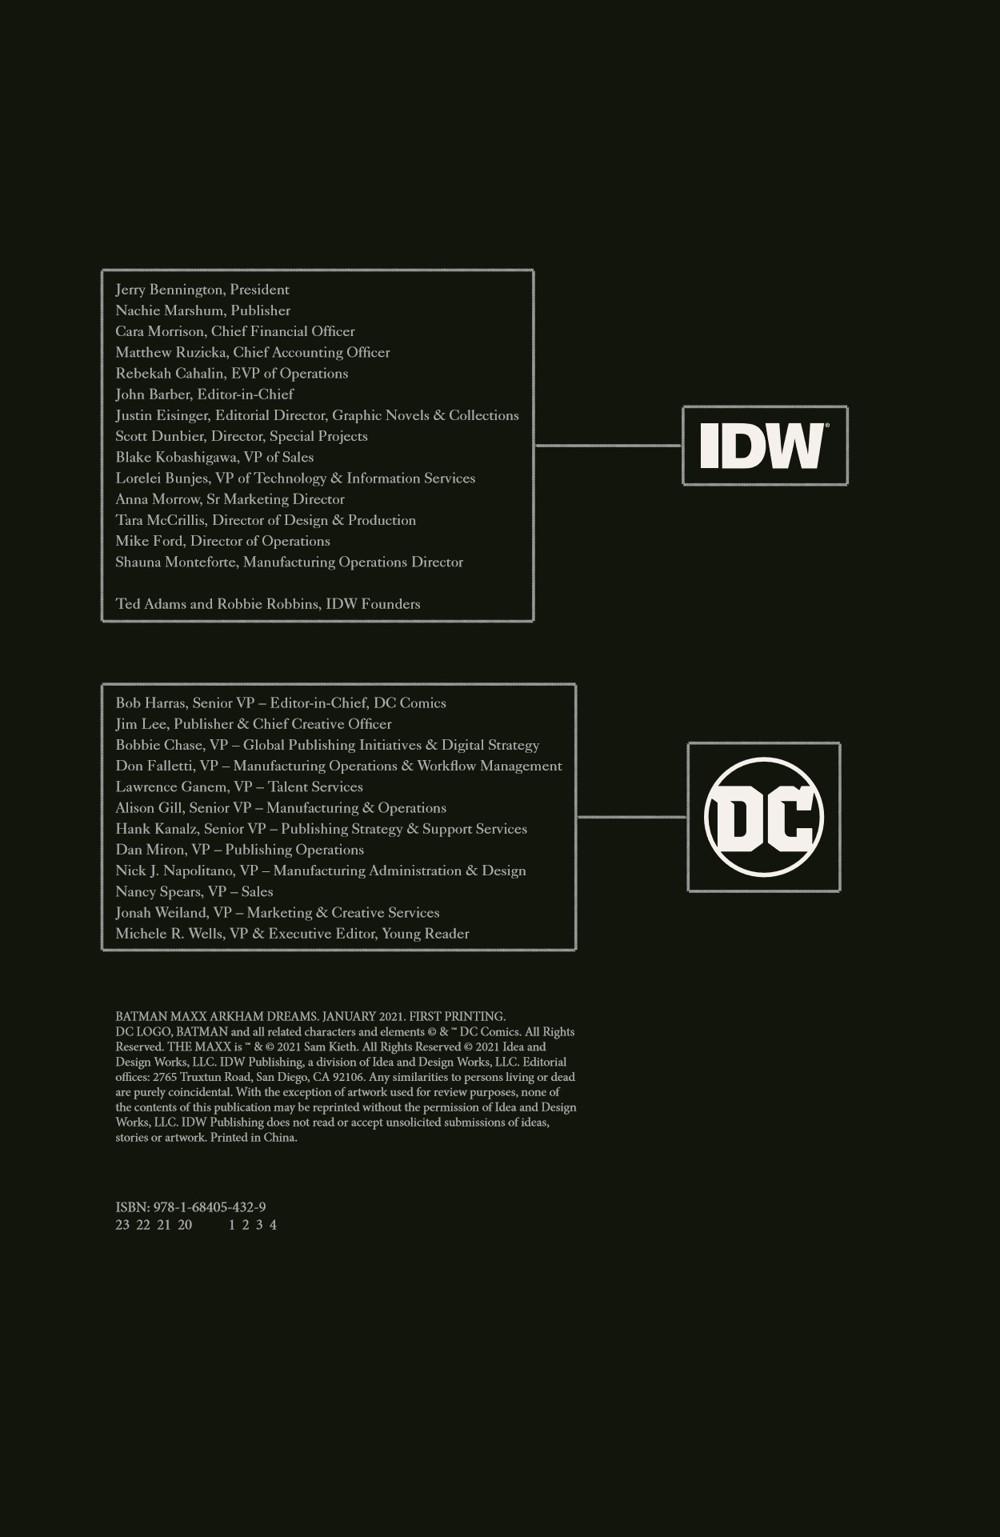 Batman-Maxx-HC_pr-2 ComicList Previews: BATMAN THE MAXX ARKHAM DREAMS HC